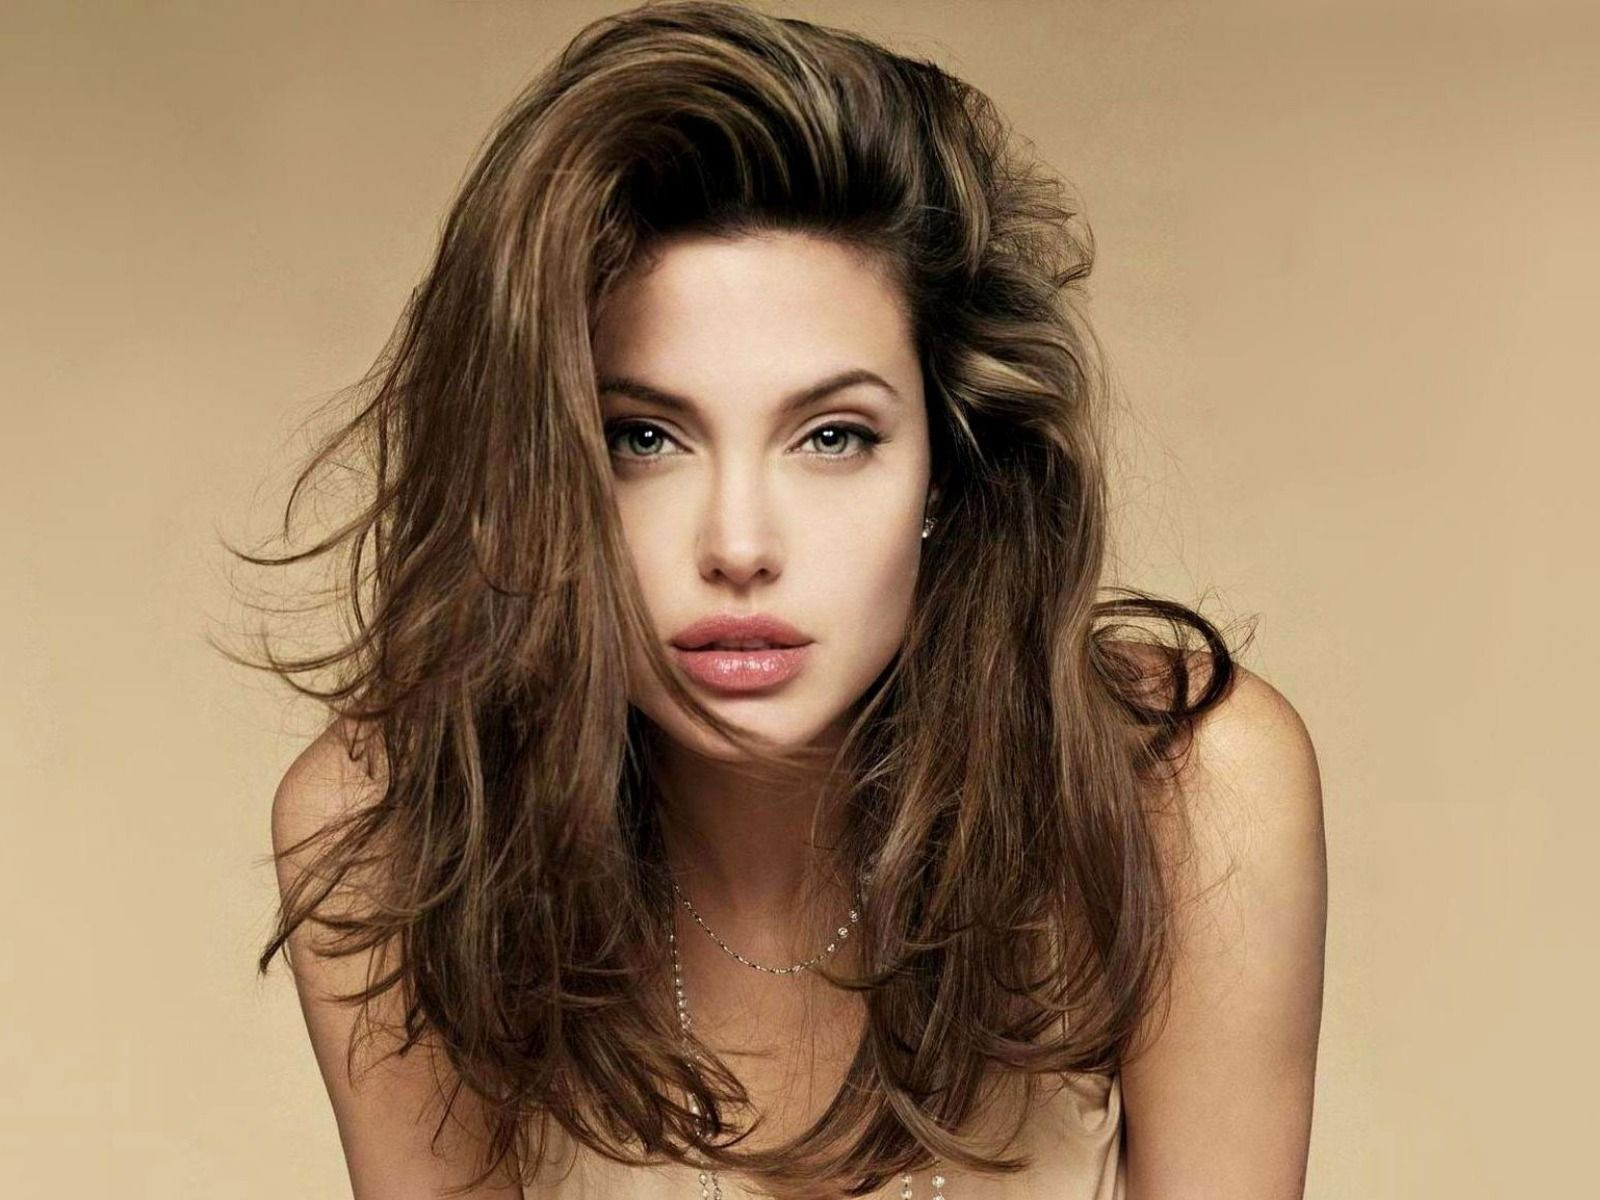 Angelina Jolie Hair Wallpaper Angelina Jolie Hair Messy Hairstyles Medium Length Hair Styles